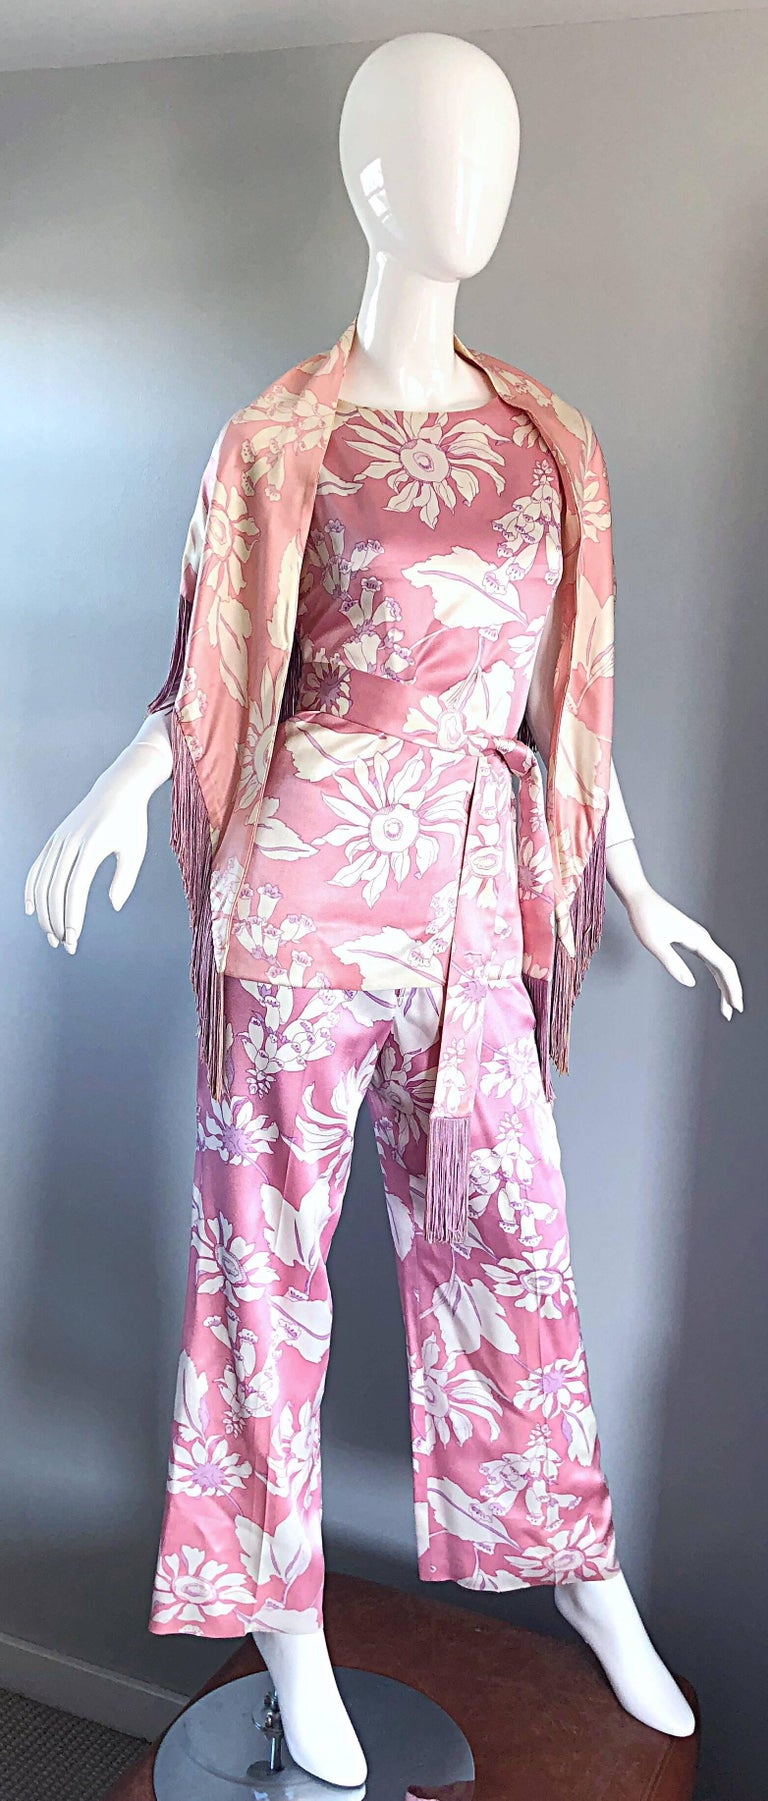 Geoffrey Beene Vintage 1970s Pink + White Four Piece Silk Pants Top Belt & Shawl For Sale 3